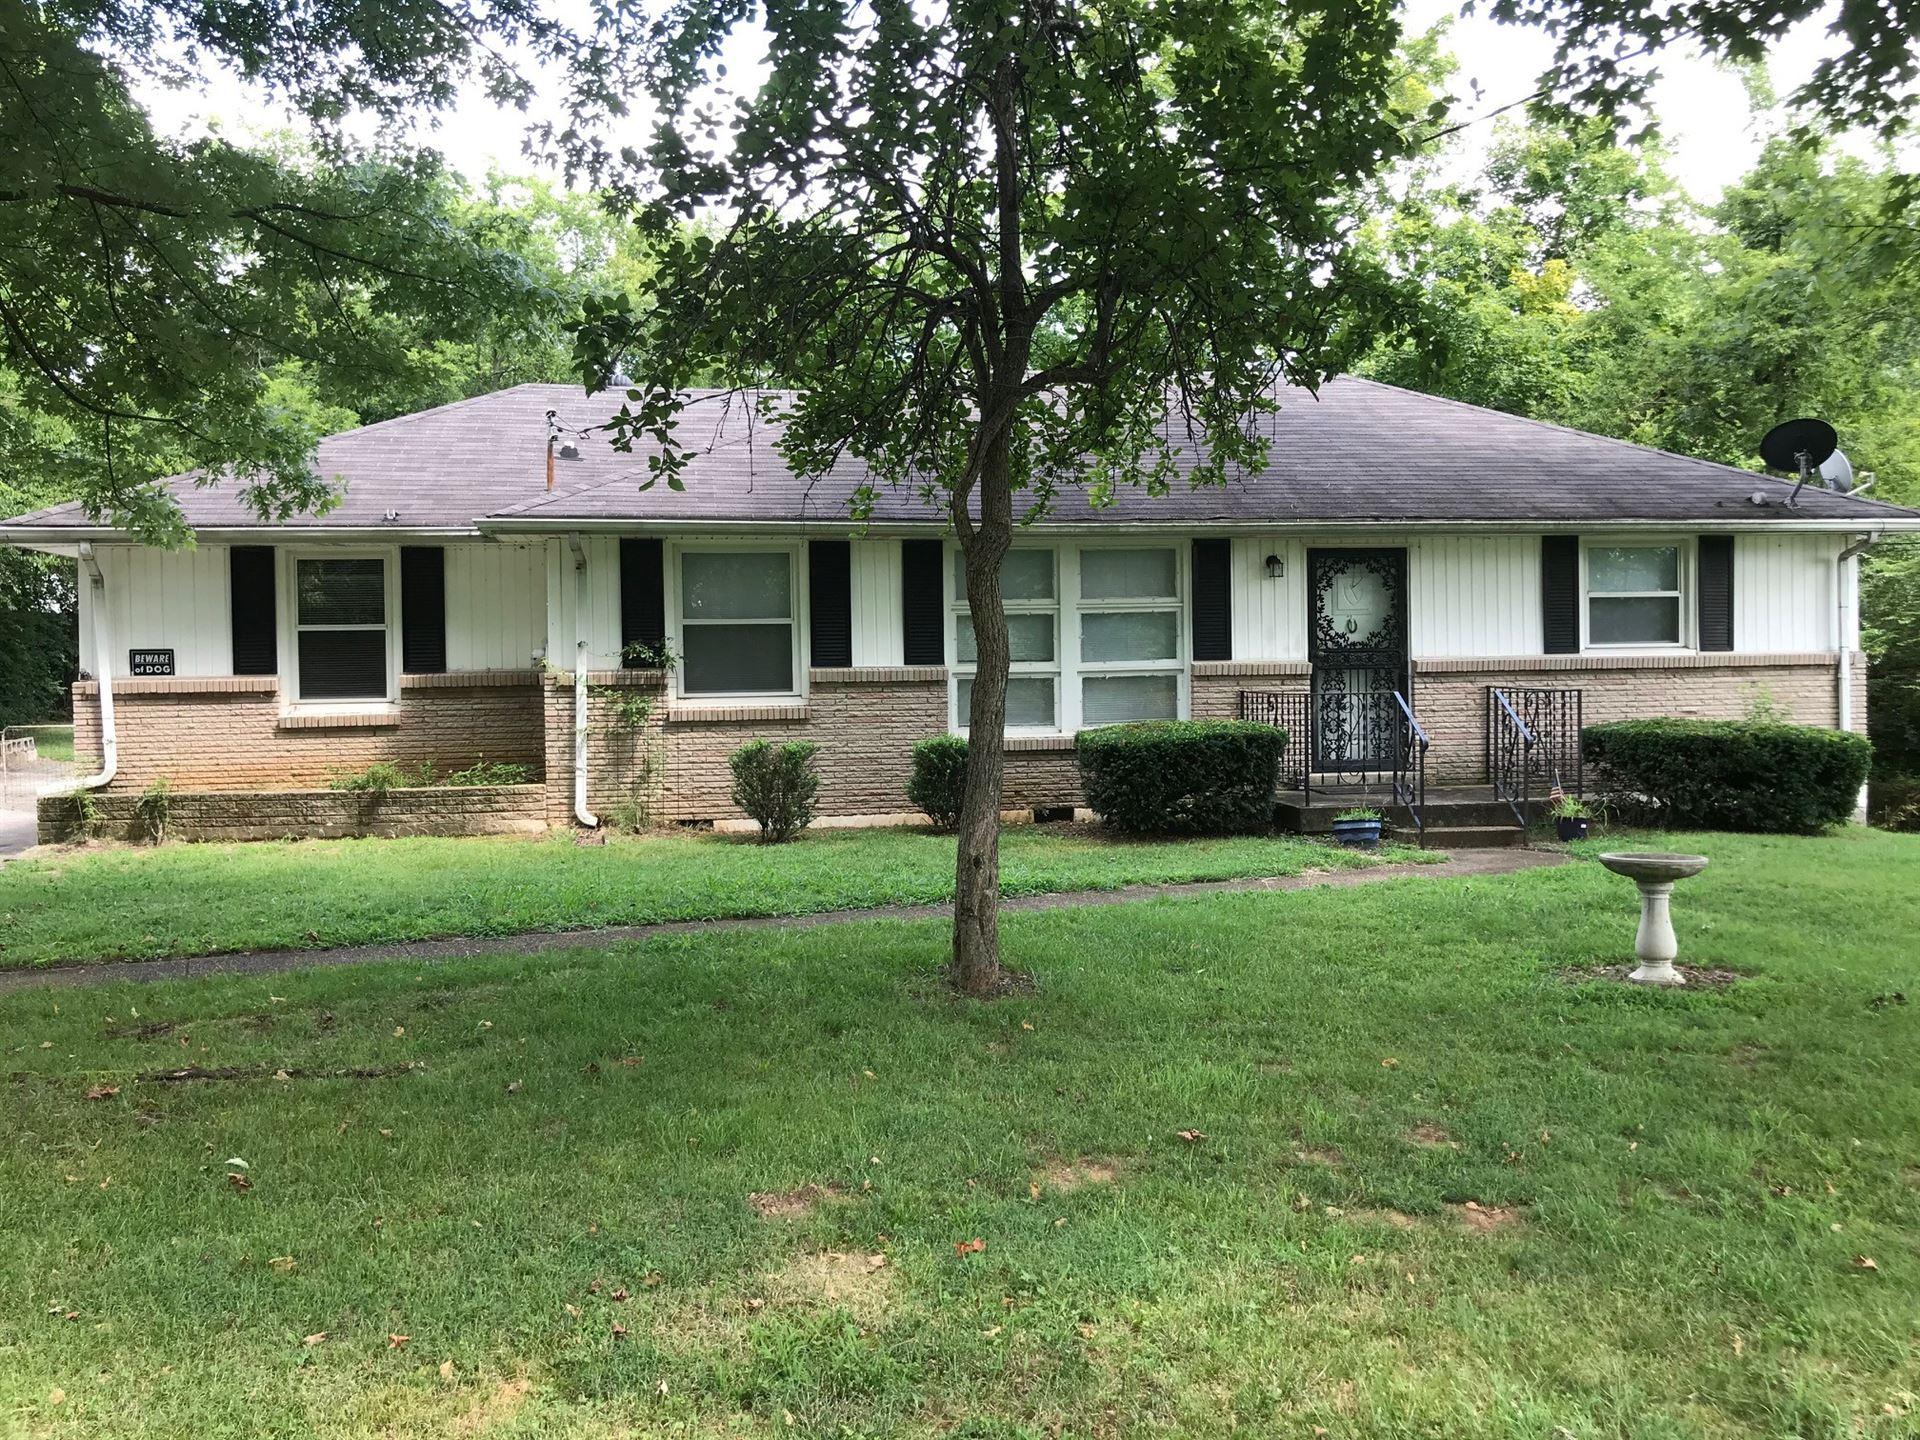 Photo of 906 Radford Dr, Nashville, TN 37217 (MLS # 2178230)